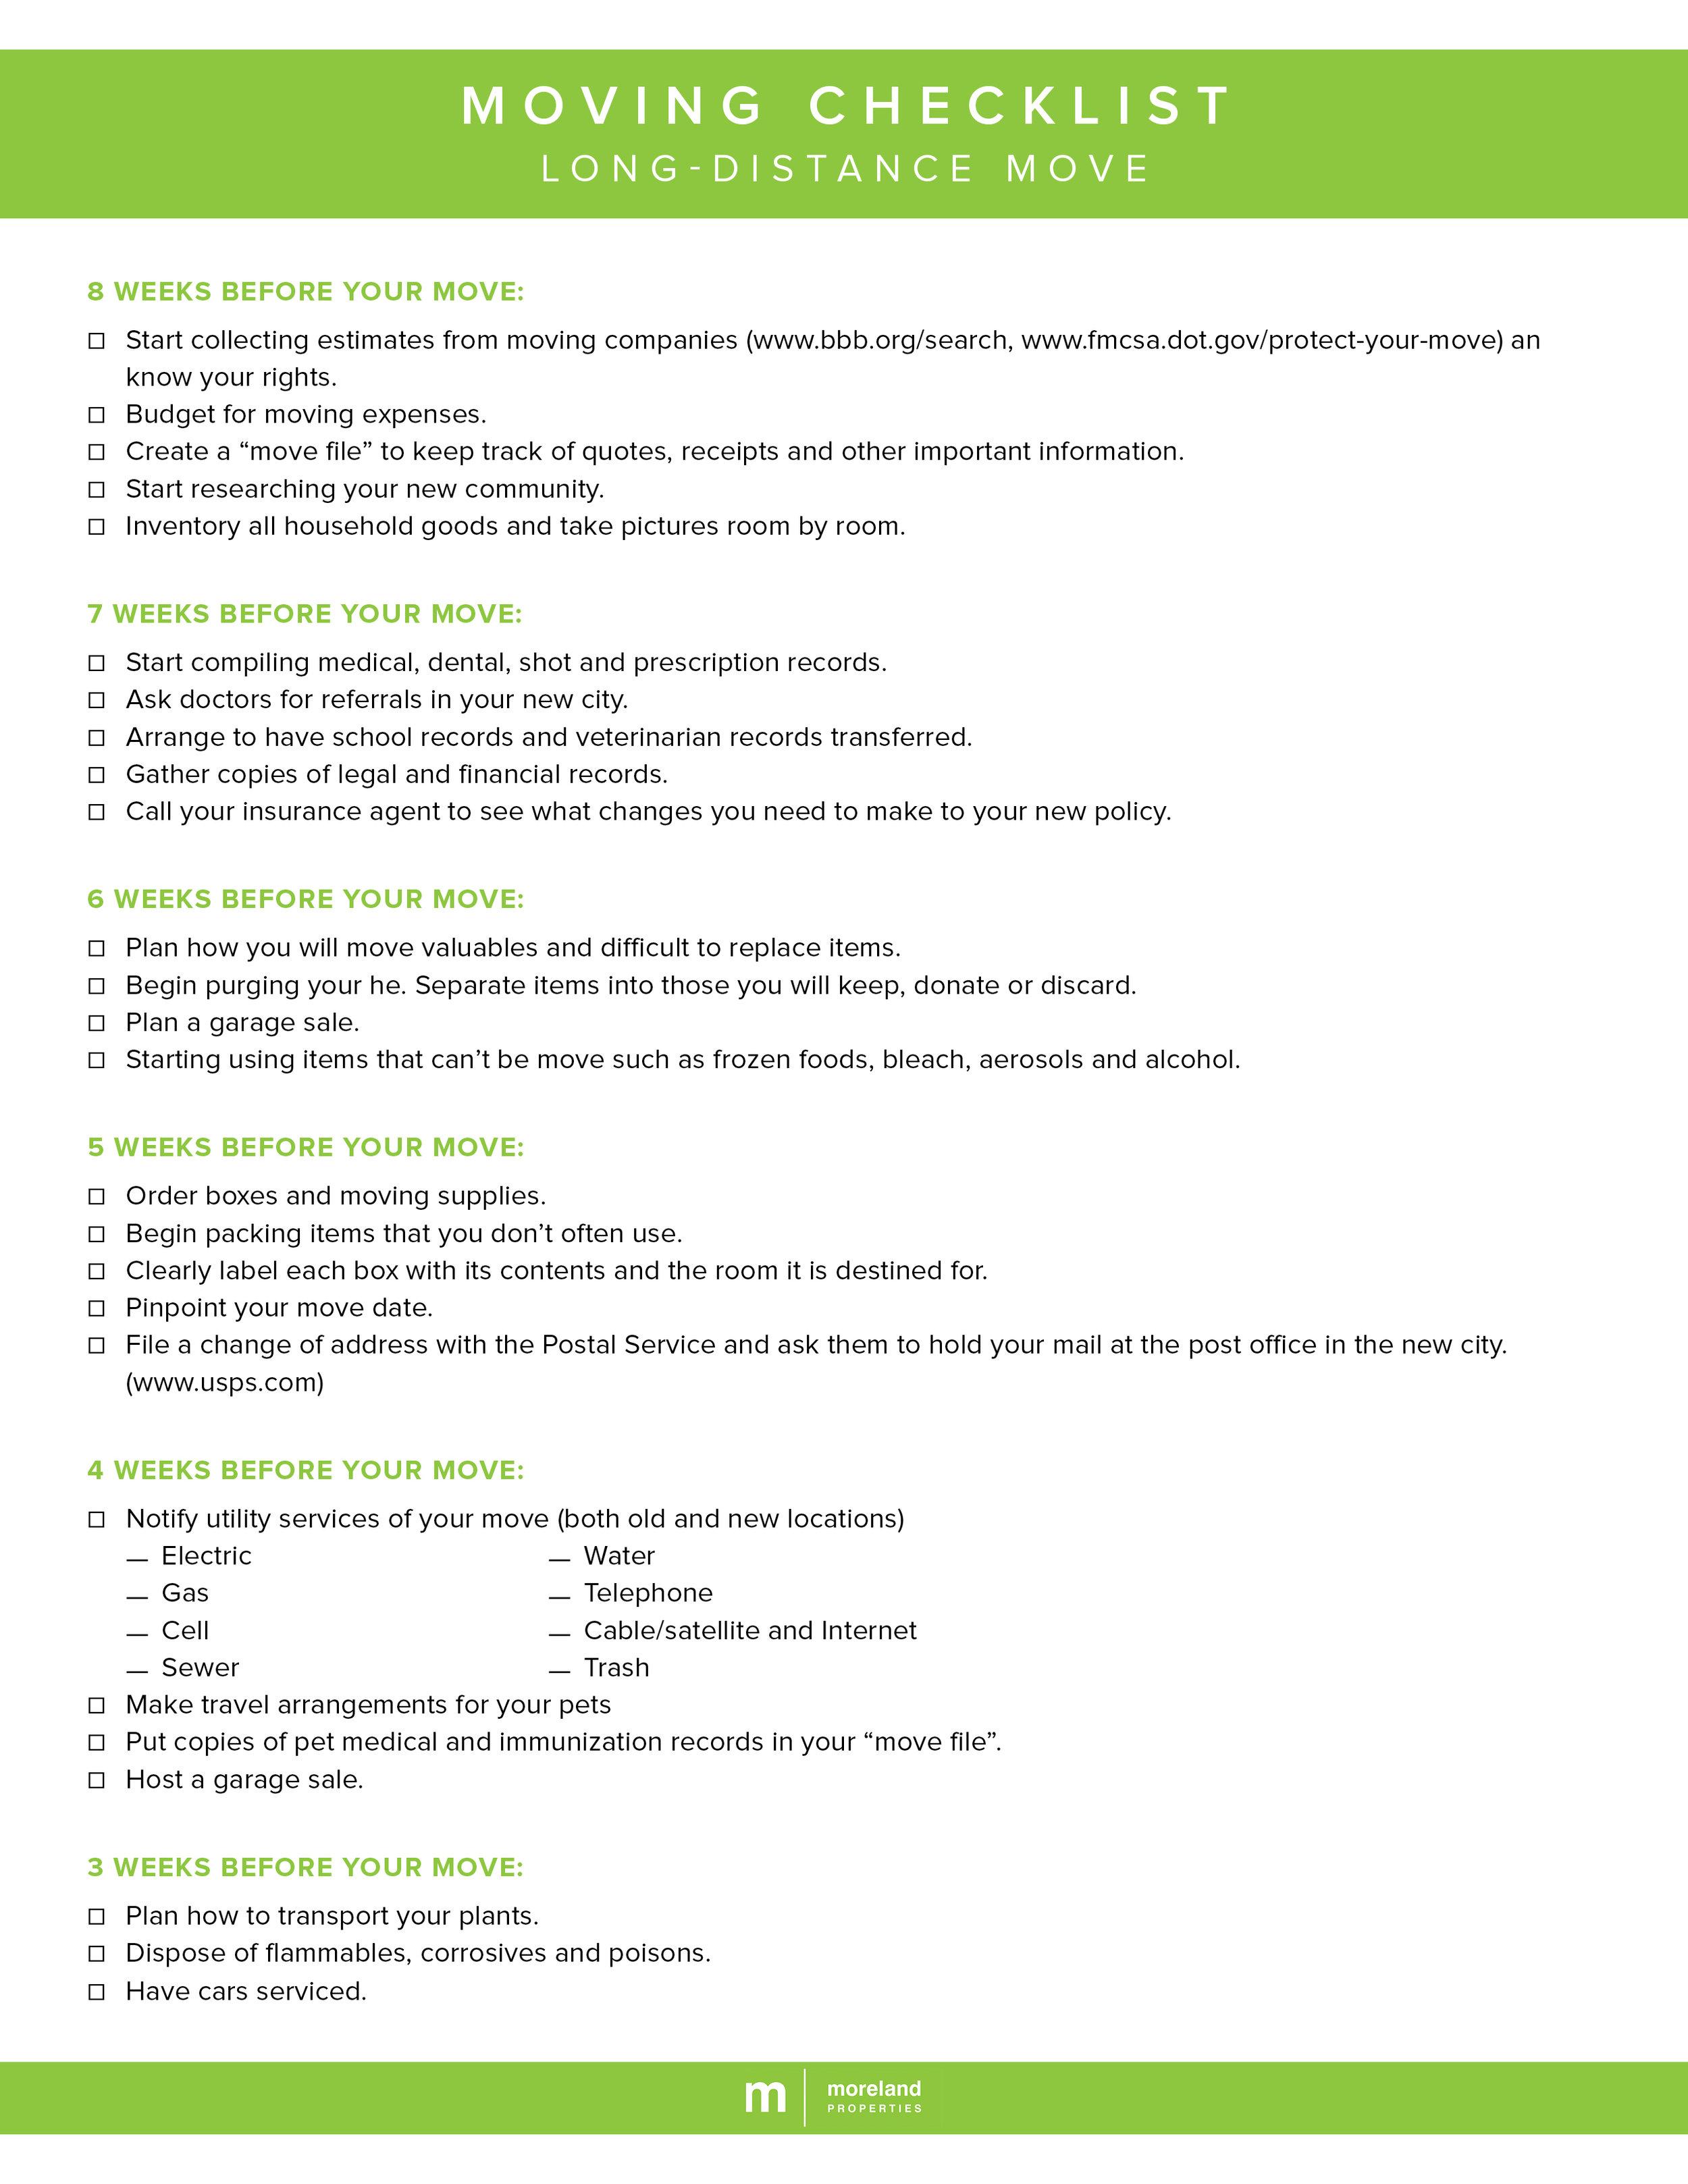 Moving Checklist - Long Distance.jpg